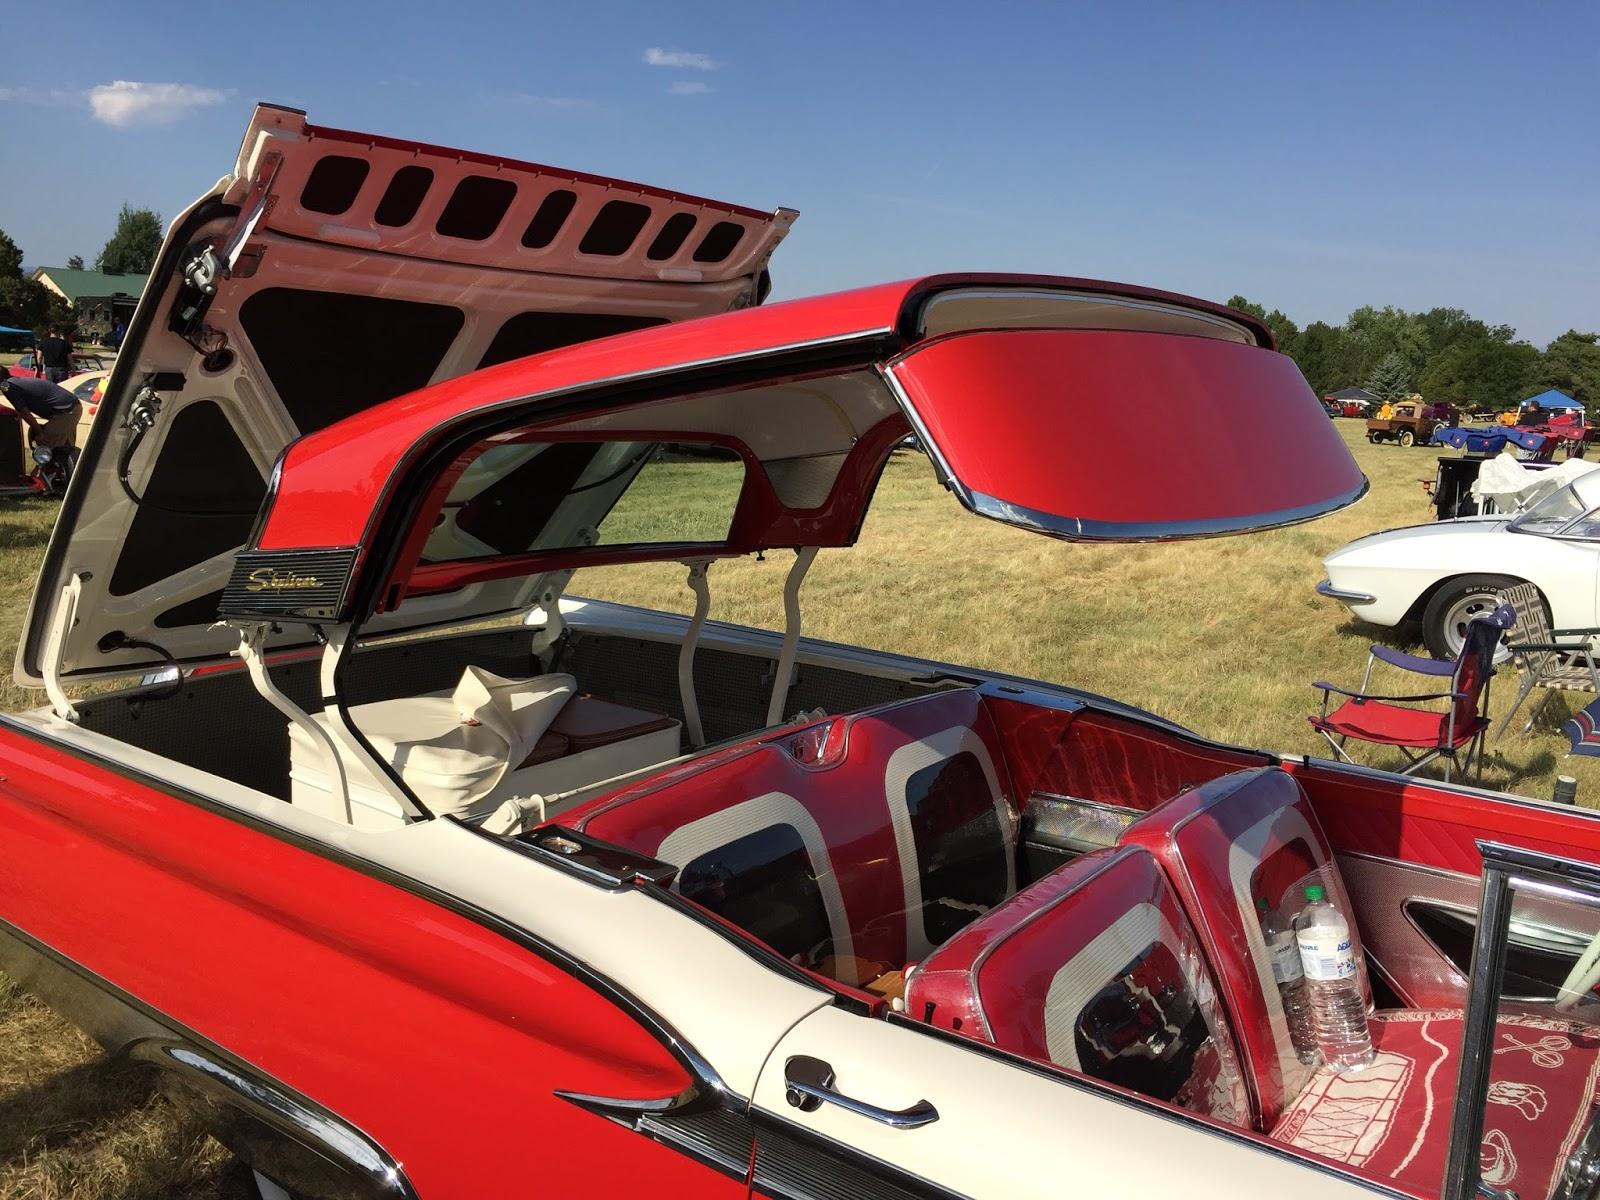 Colorado Springs EV Club Met a new Tesla owner at the Chenango